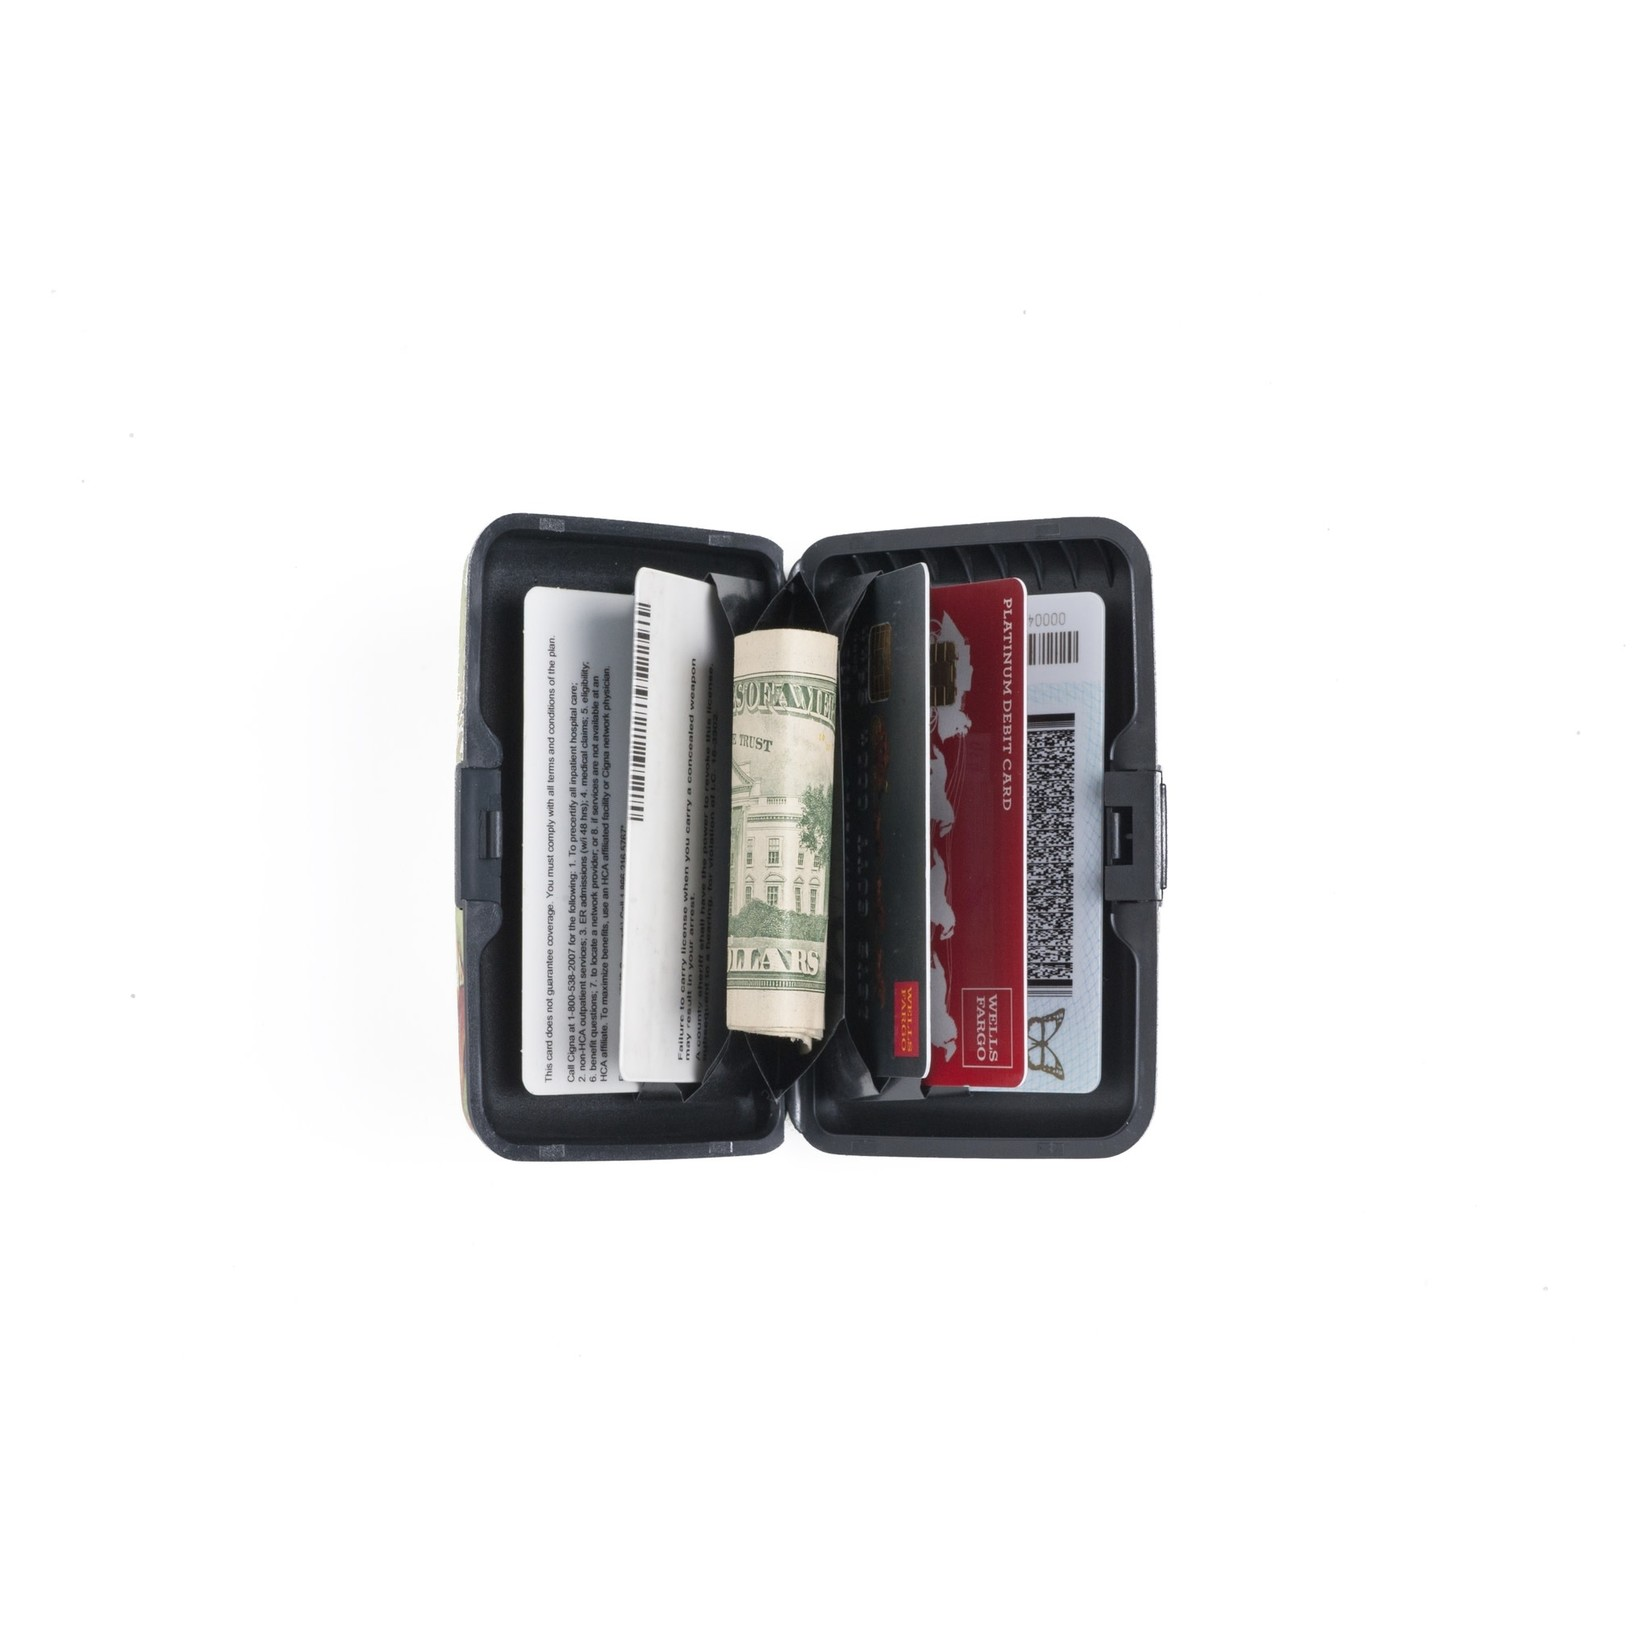 Monarque Armored Wallet - Peonies